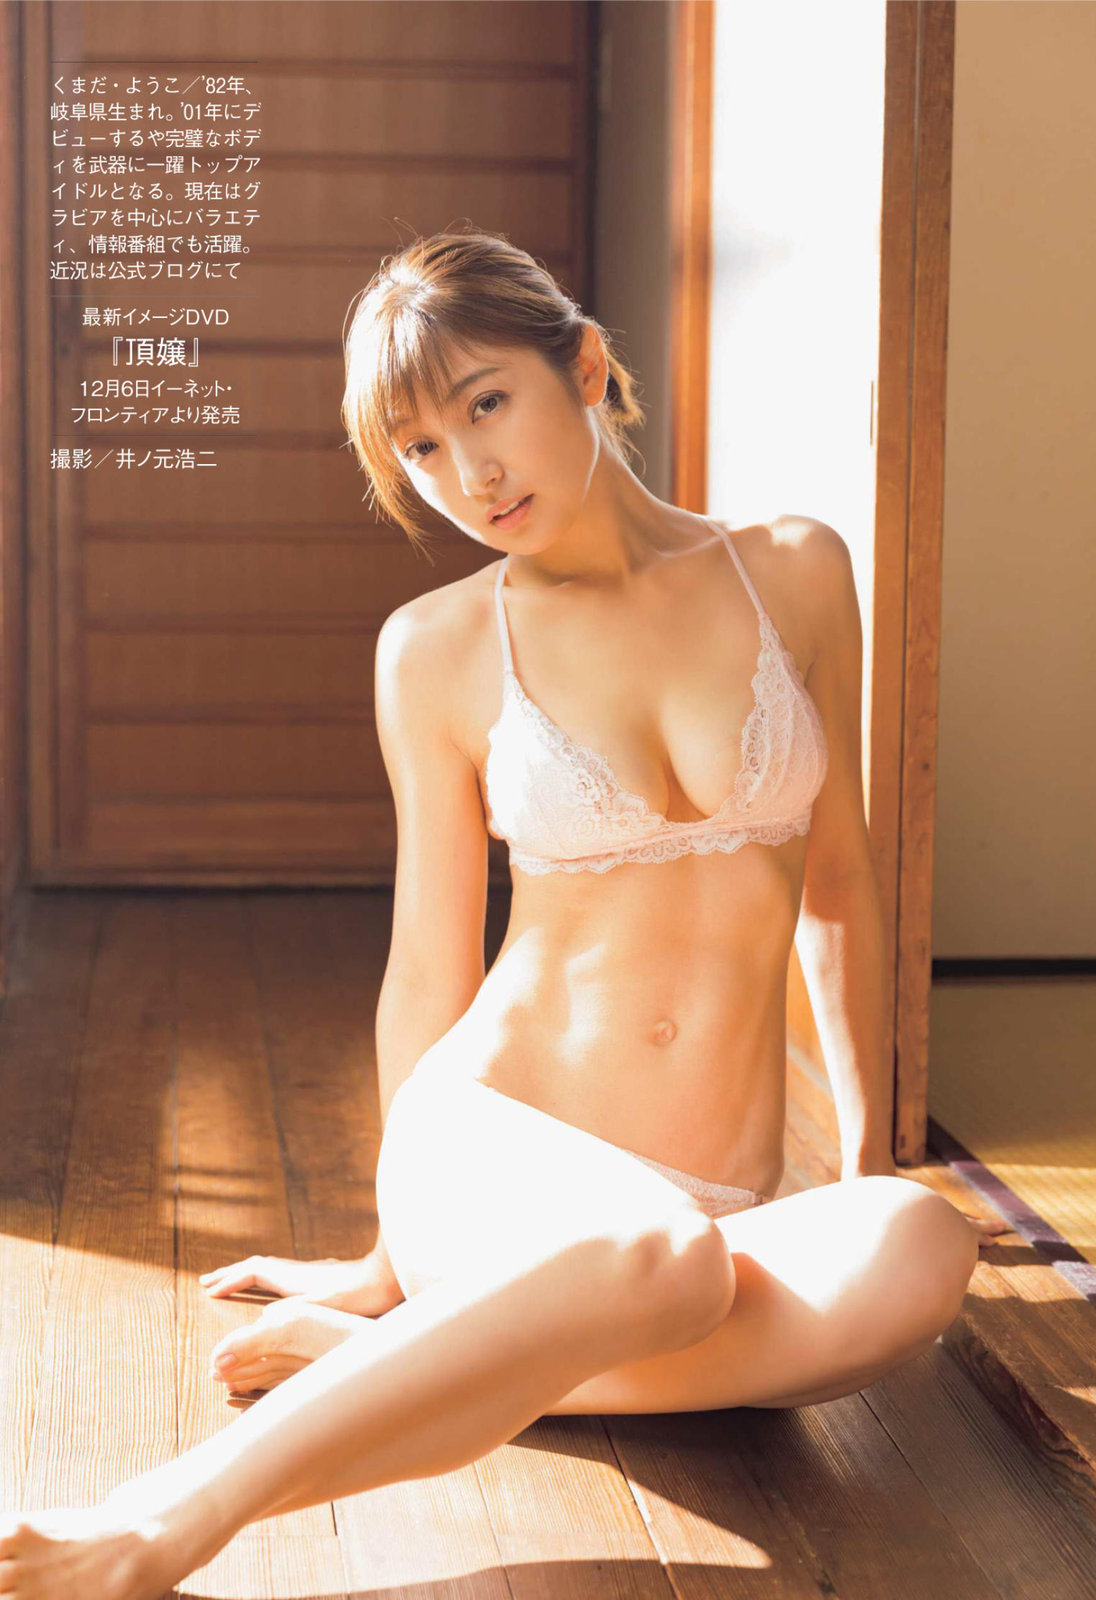 Yoko Kumada 熊田曜子, Shukan Gendai 2017.11.04 (週刊現代 2017年11月04日号)